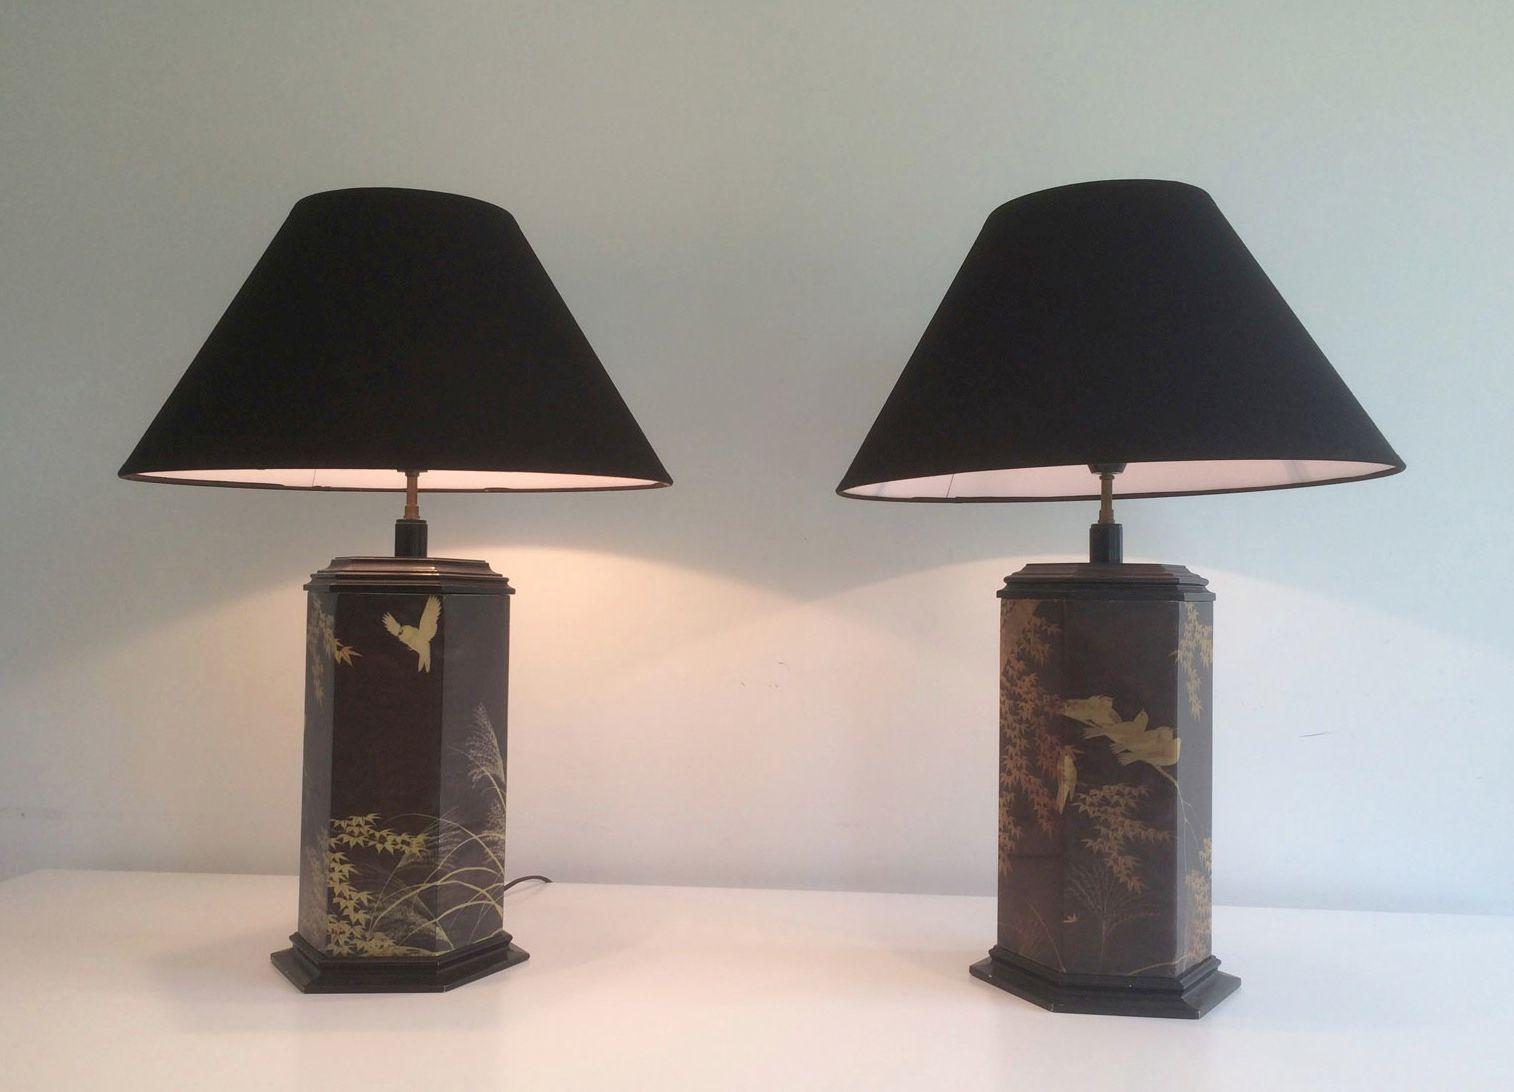 Chinoiserie lampen 1970er 2er set bei pamono kaufen for Lampen niederlande